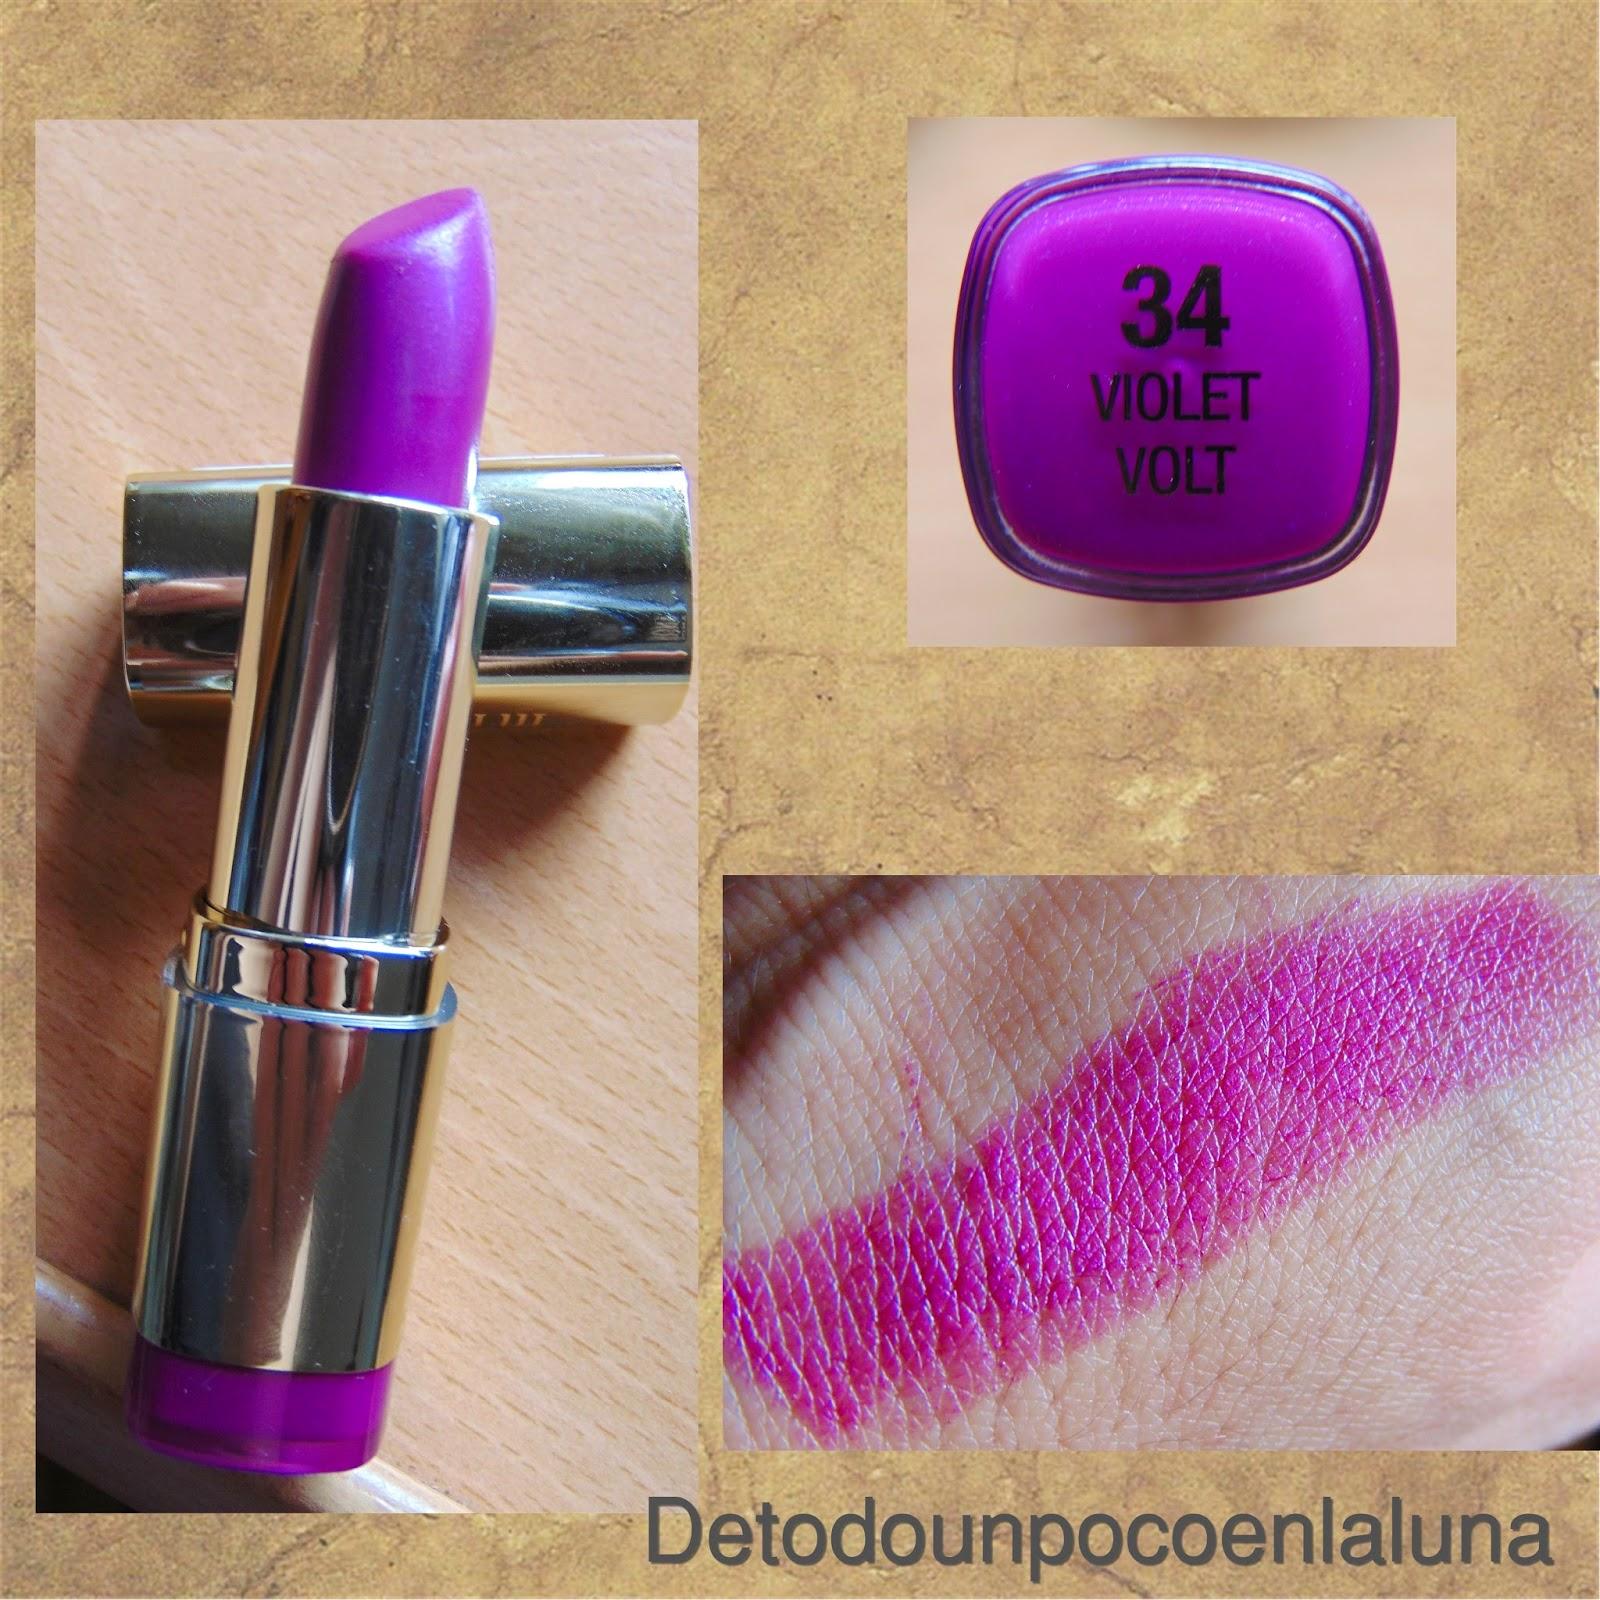 labial violet volt milani